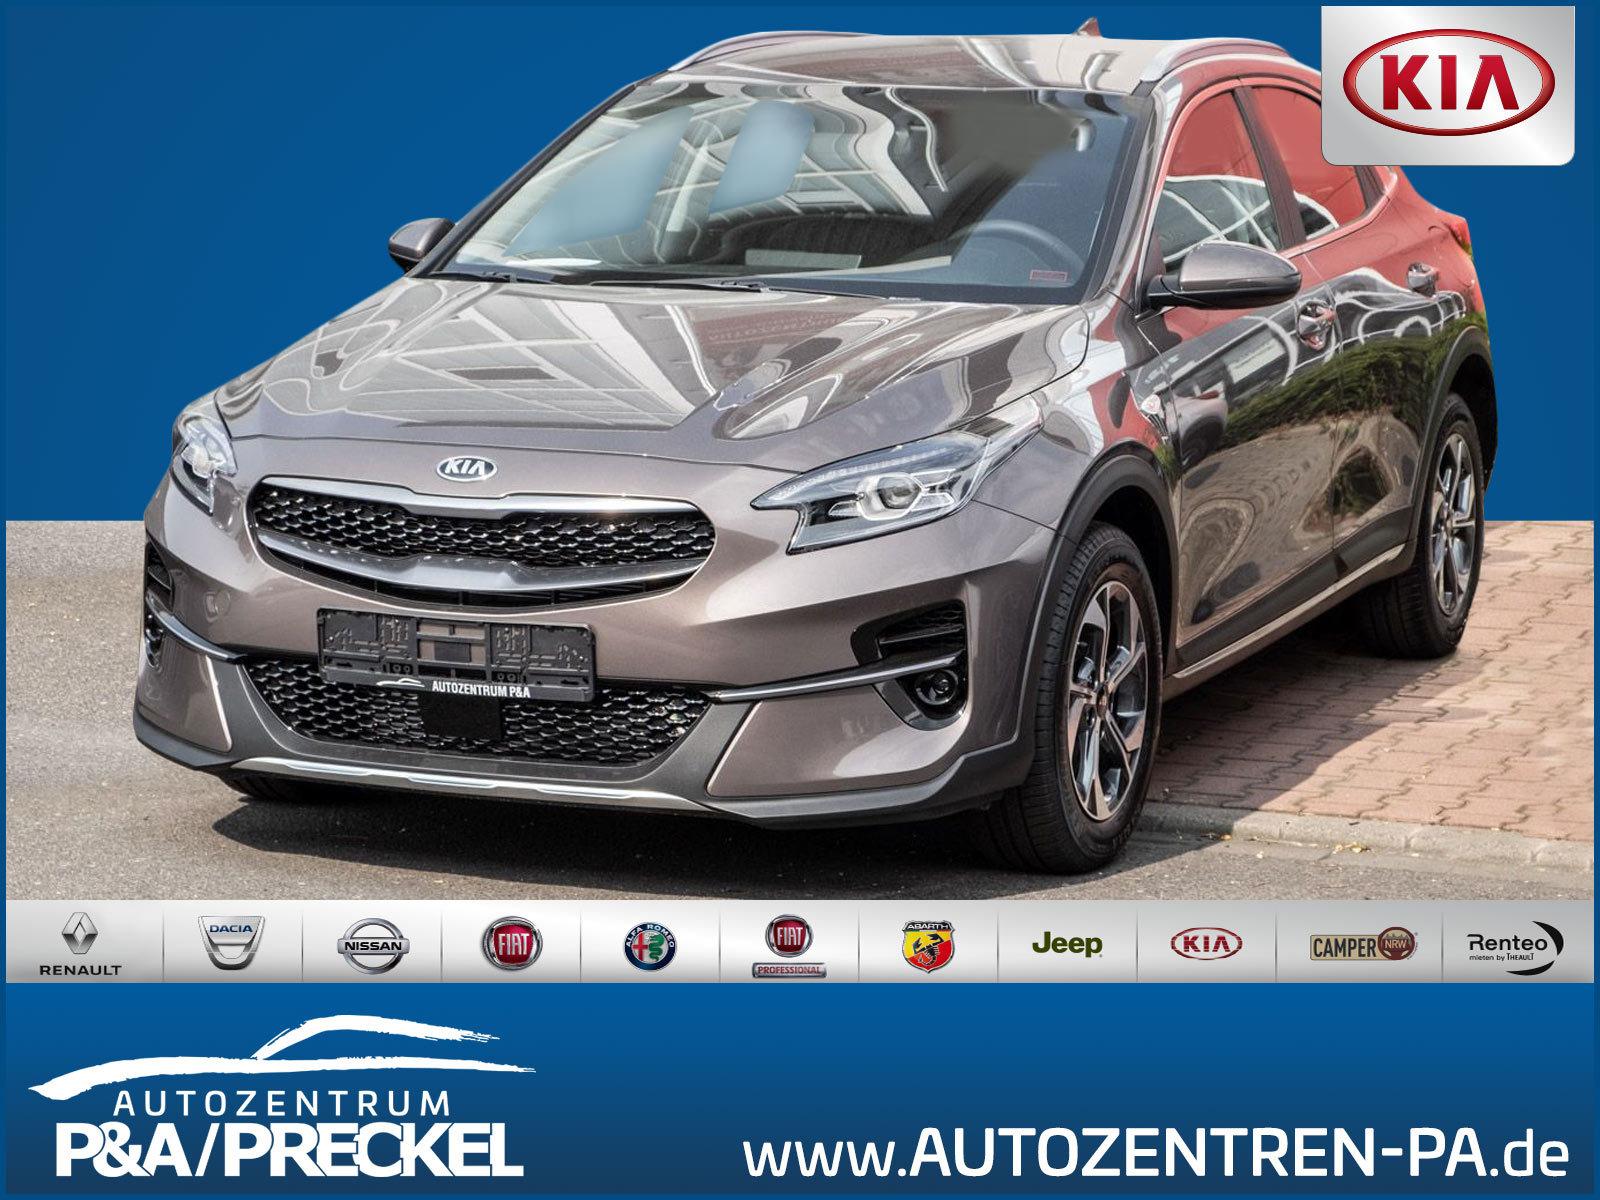 Kia XCeed EDITION 7 1.4 T-GDI / Emotion-Paket, Jahr 2020, Benzin